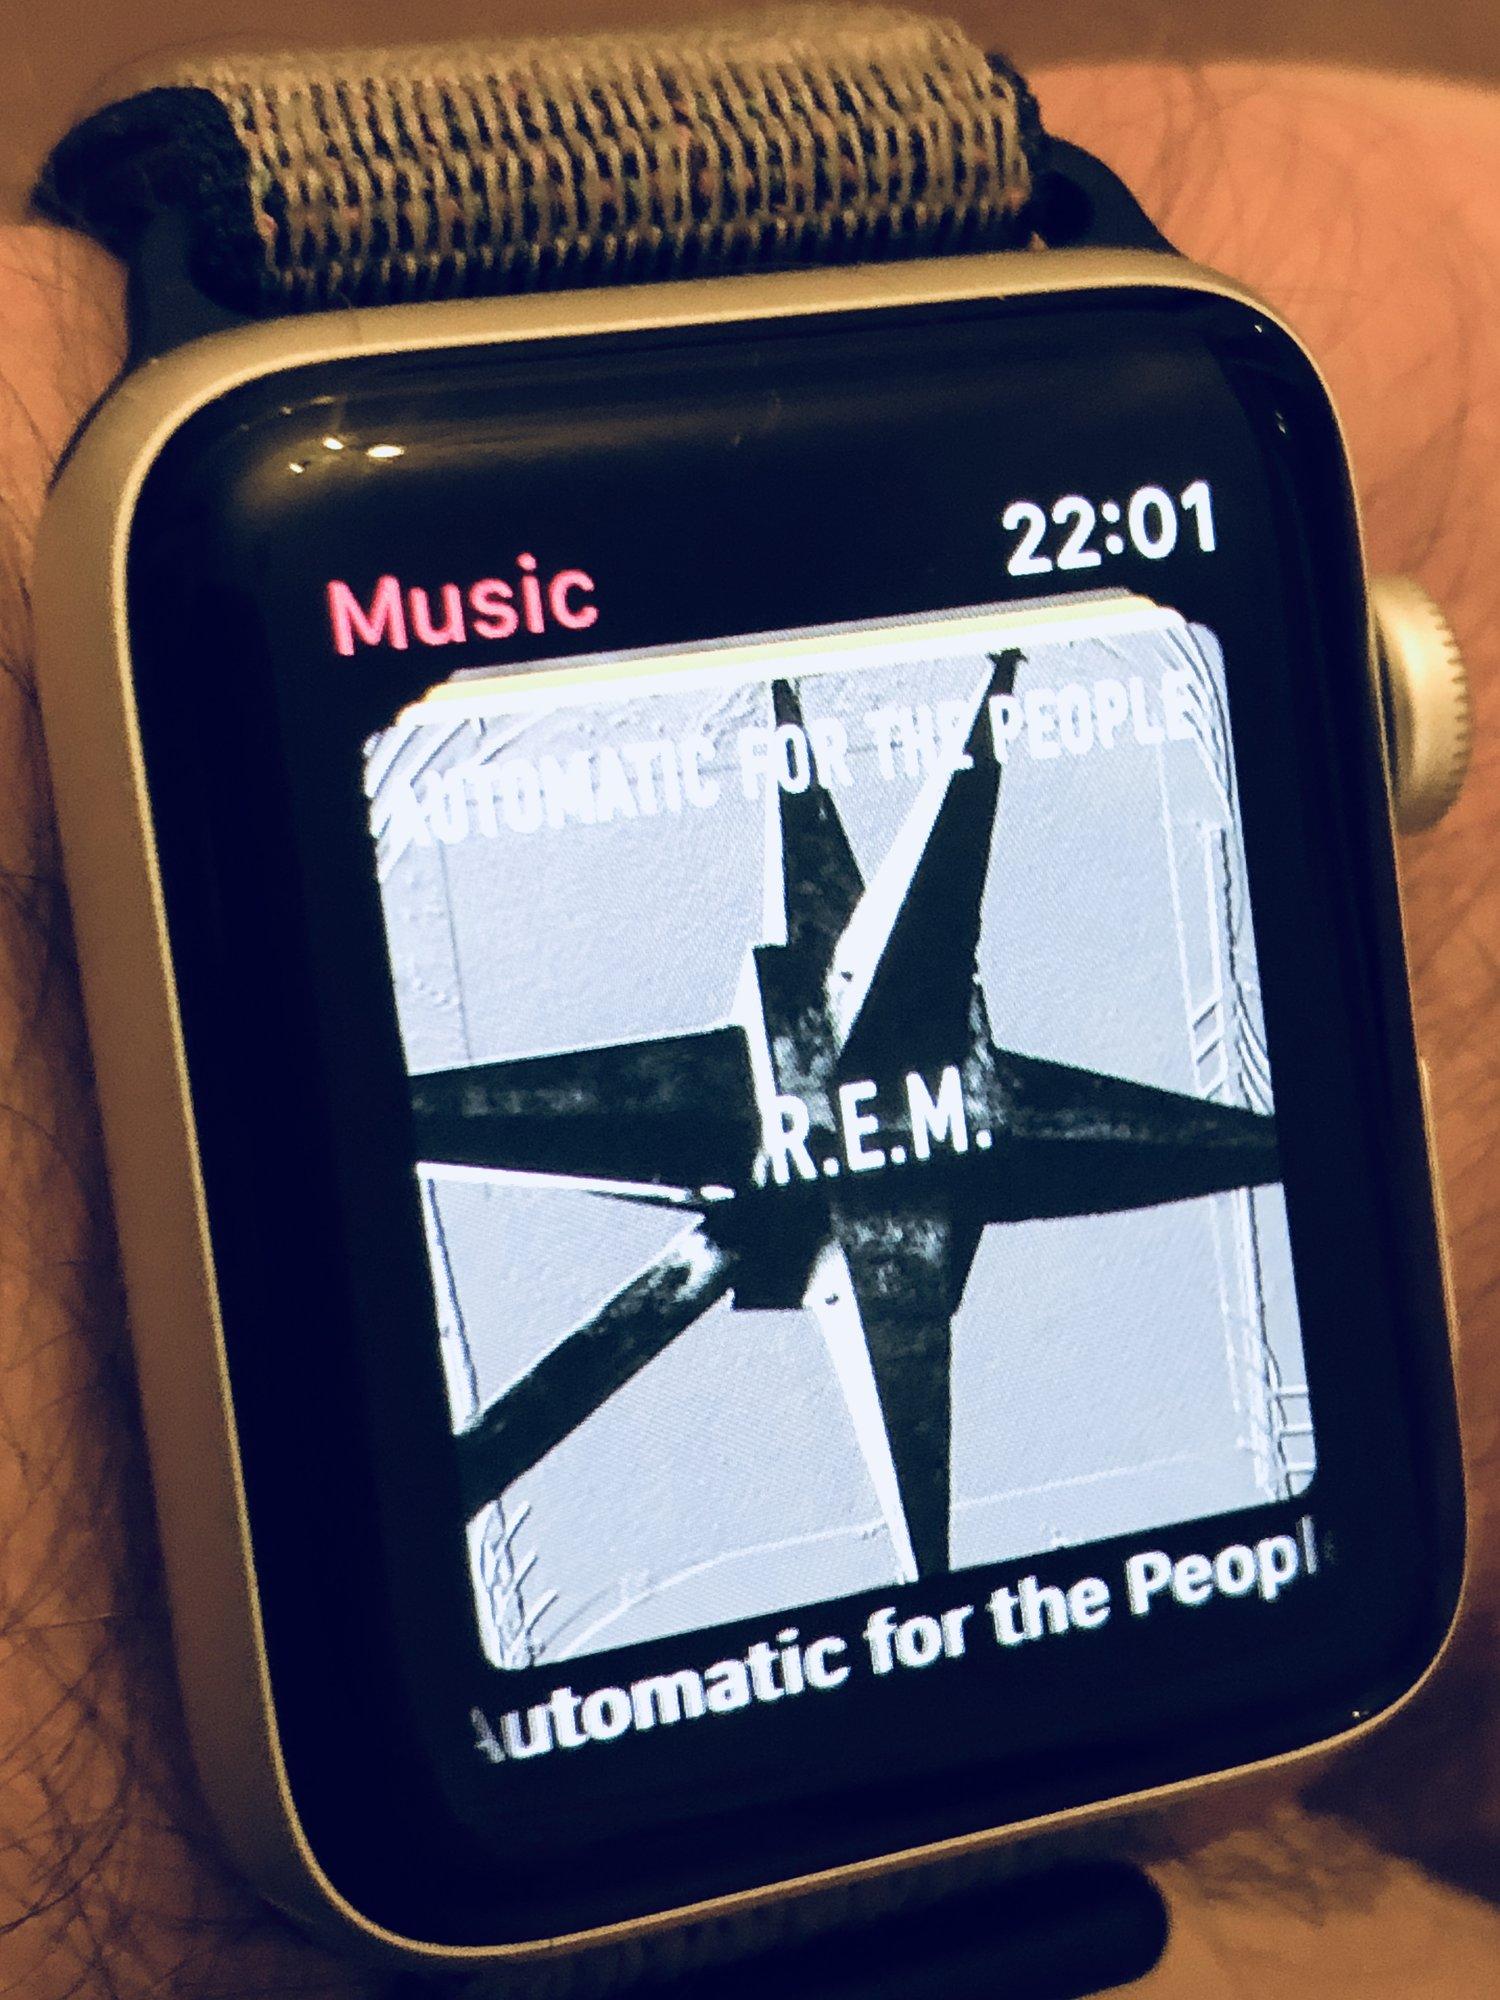 apple watch amazon music